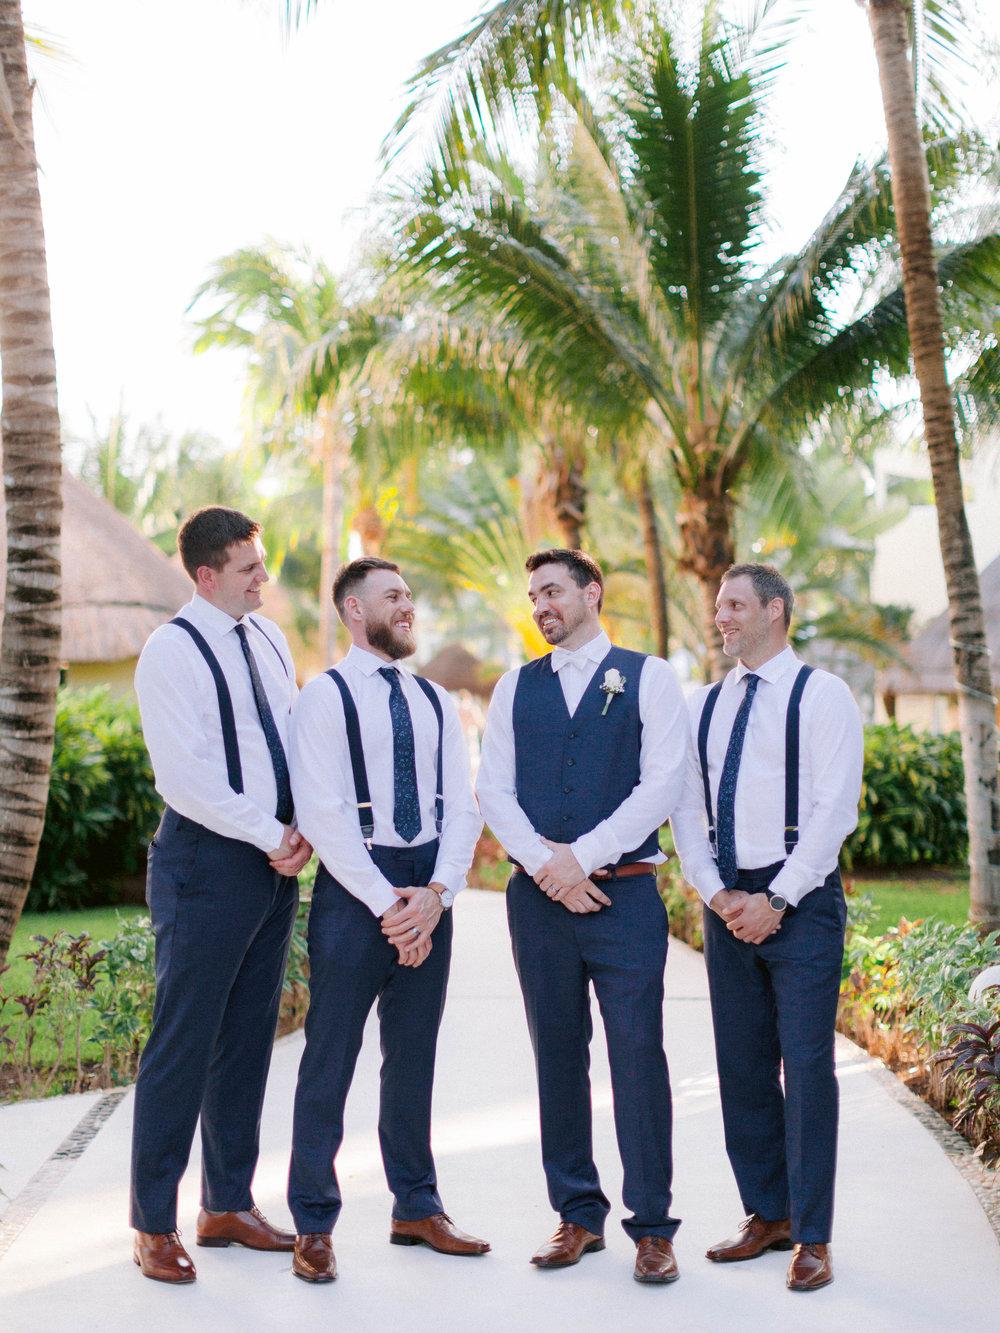 Kim_Jeff_Cancun Wedding_Portraits_Kurtz_Orpia (84 of 178).jpg